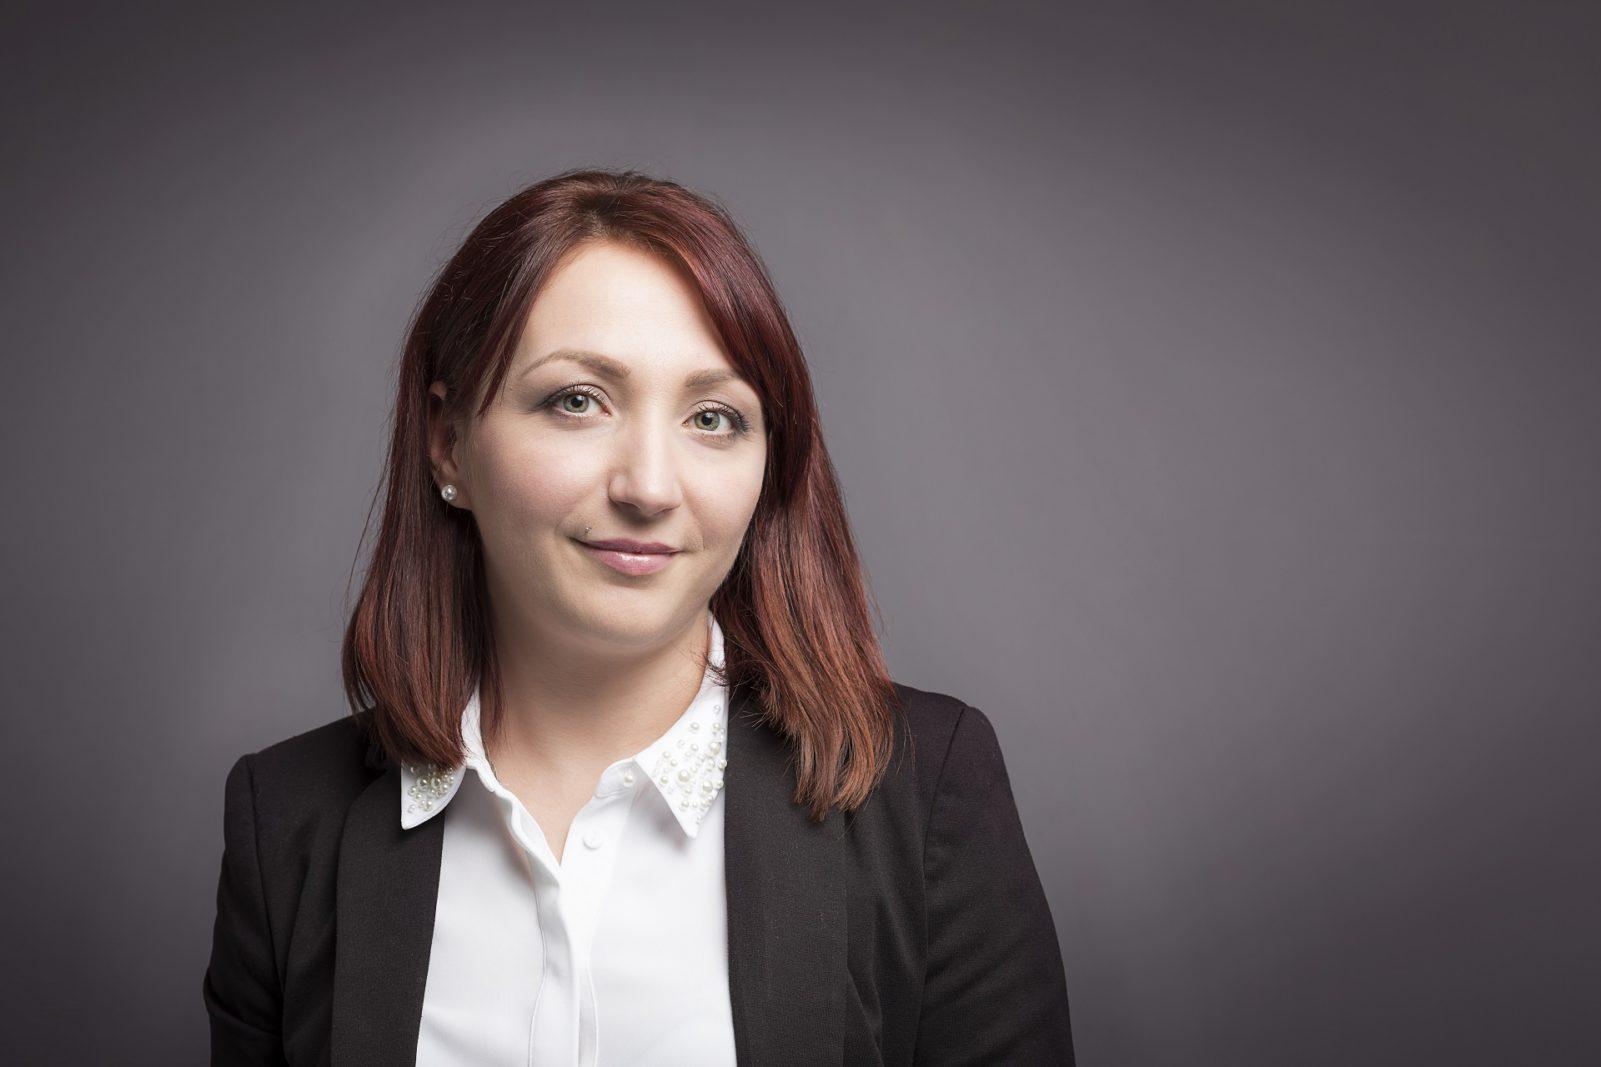 Irina Konowal